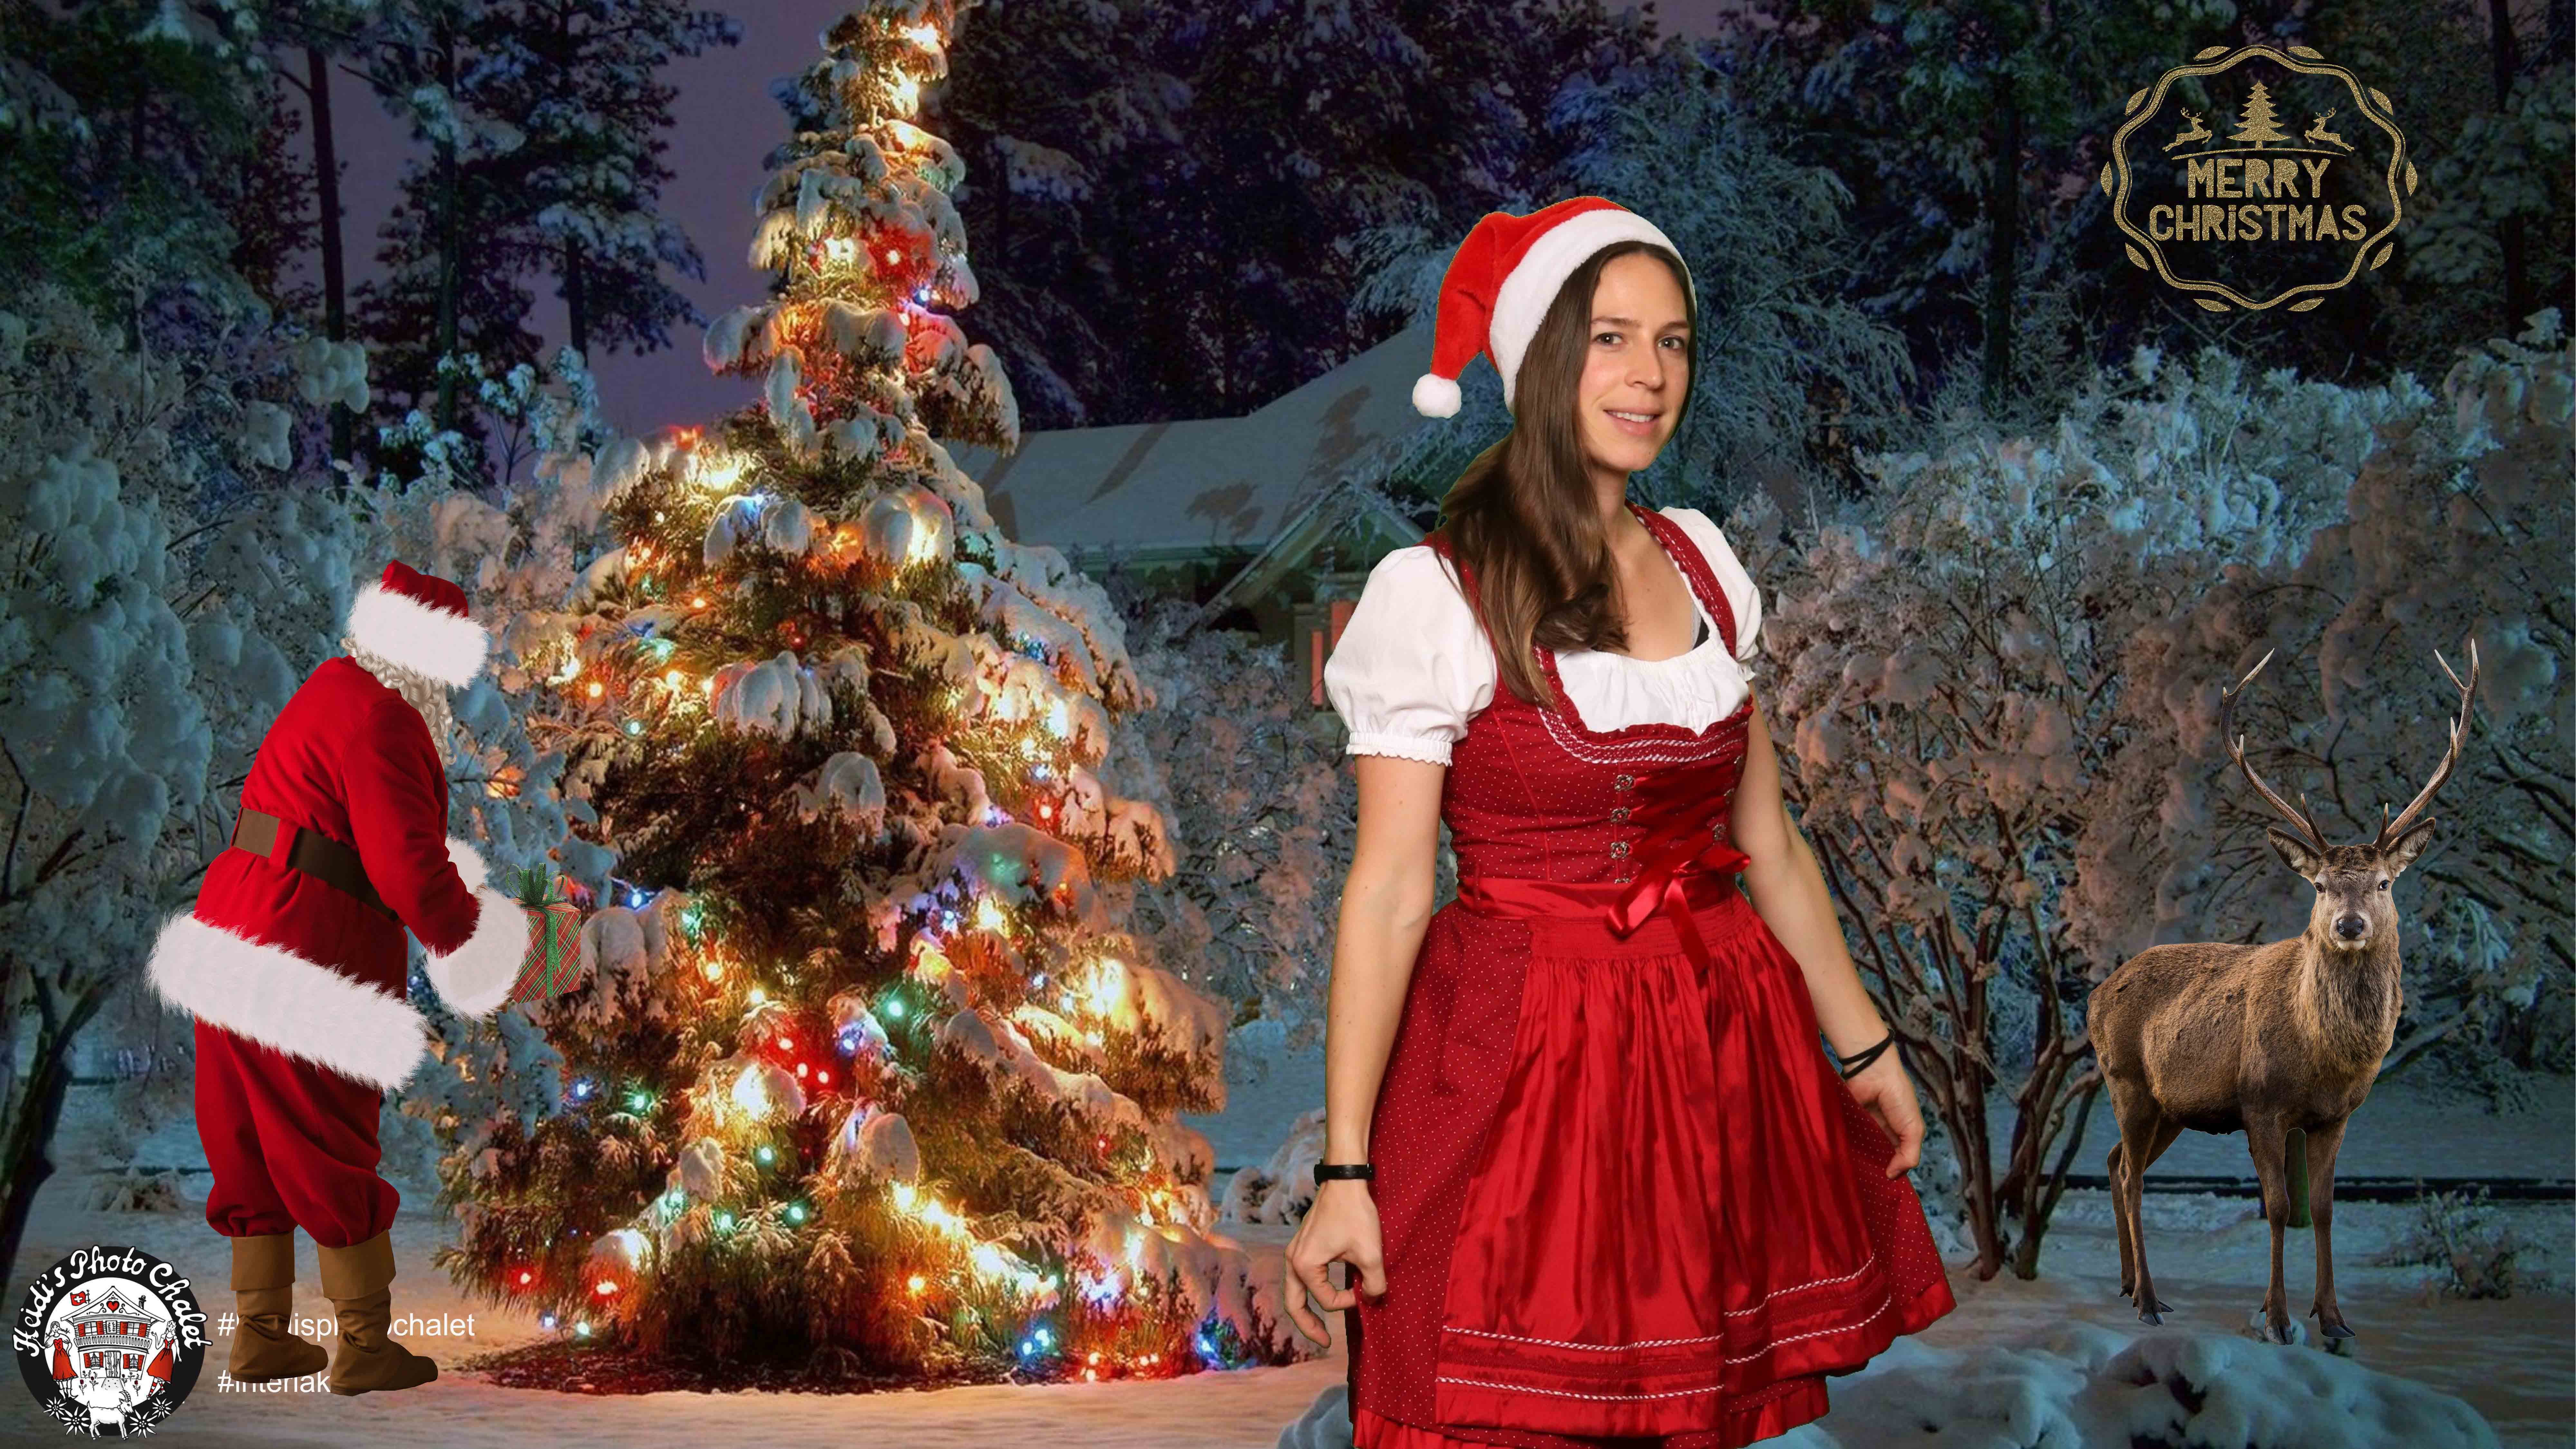 Merry Christmas - Festtagskarten